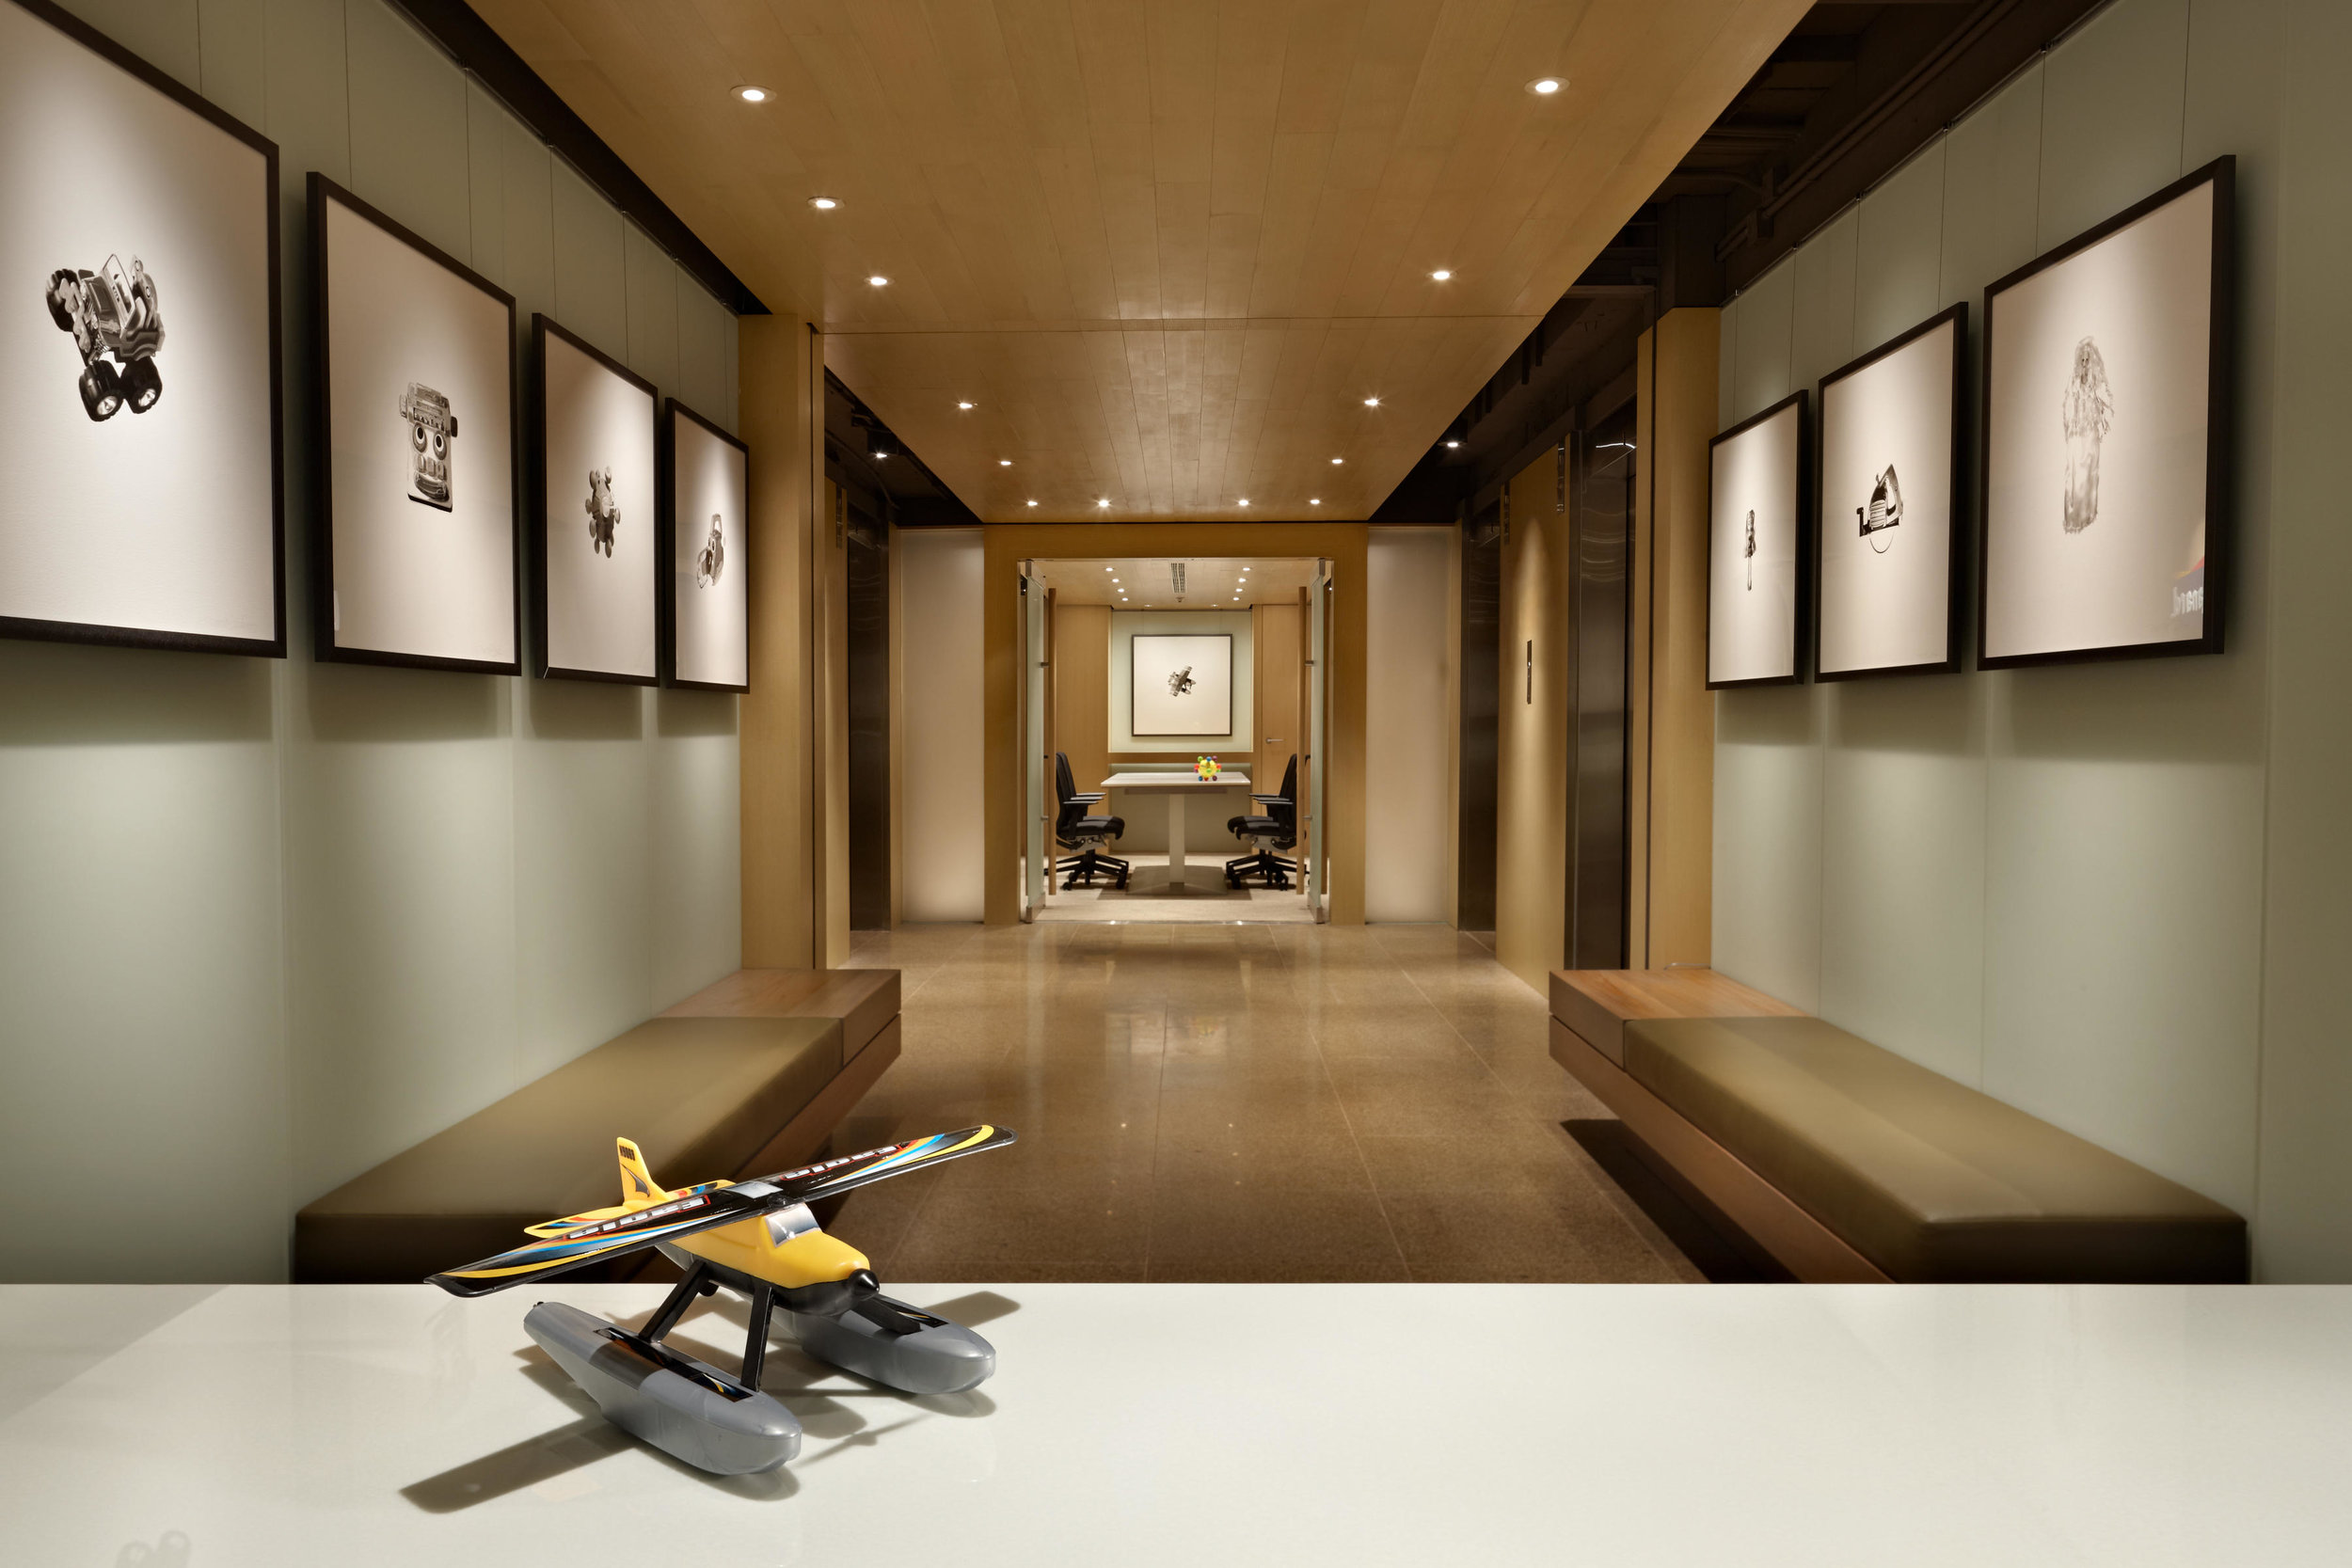 Hong Kong Toy Company Charlie Hellstern Interior Design